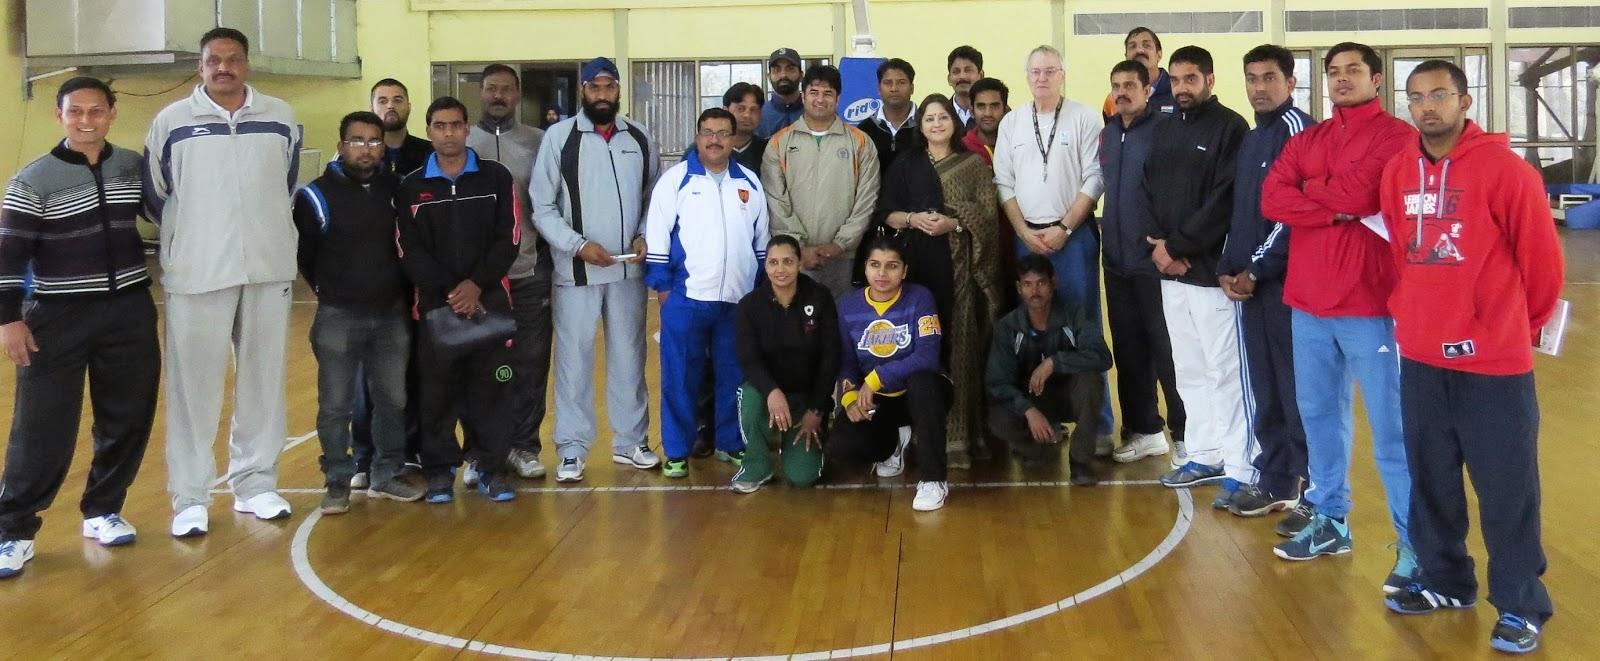 Bfi Fiba And Nba Join Hands To Organize Basketball Coaching